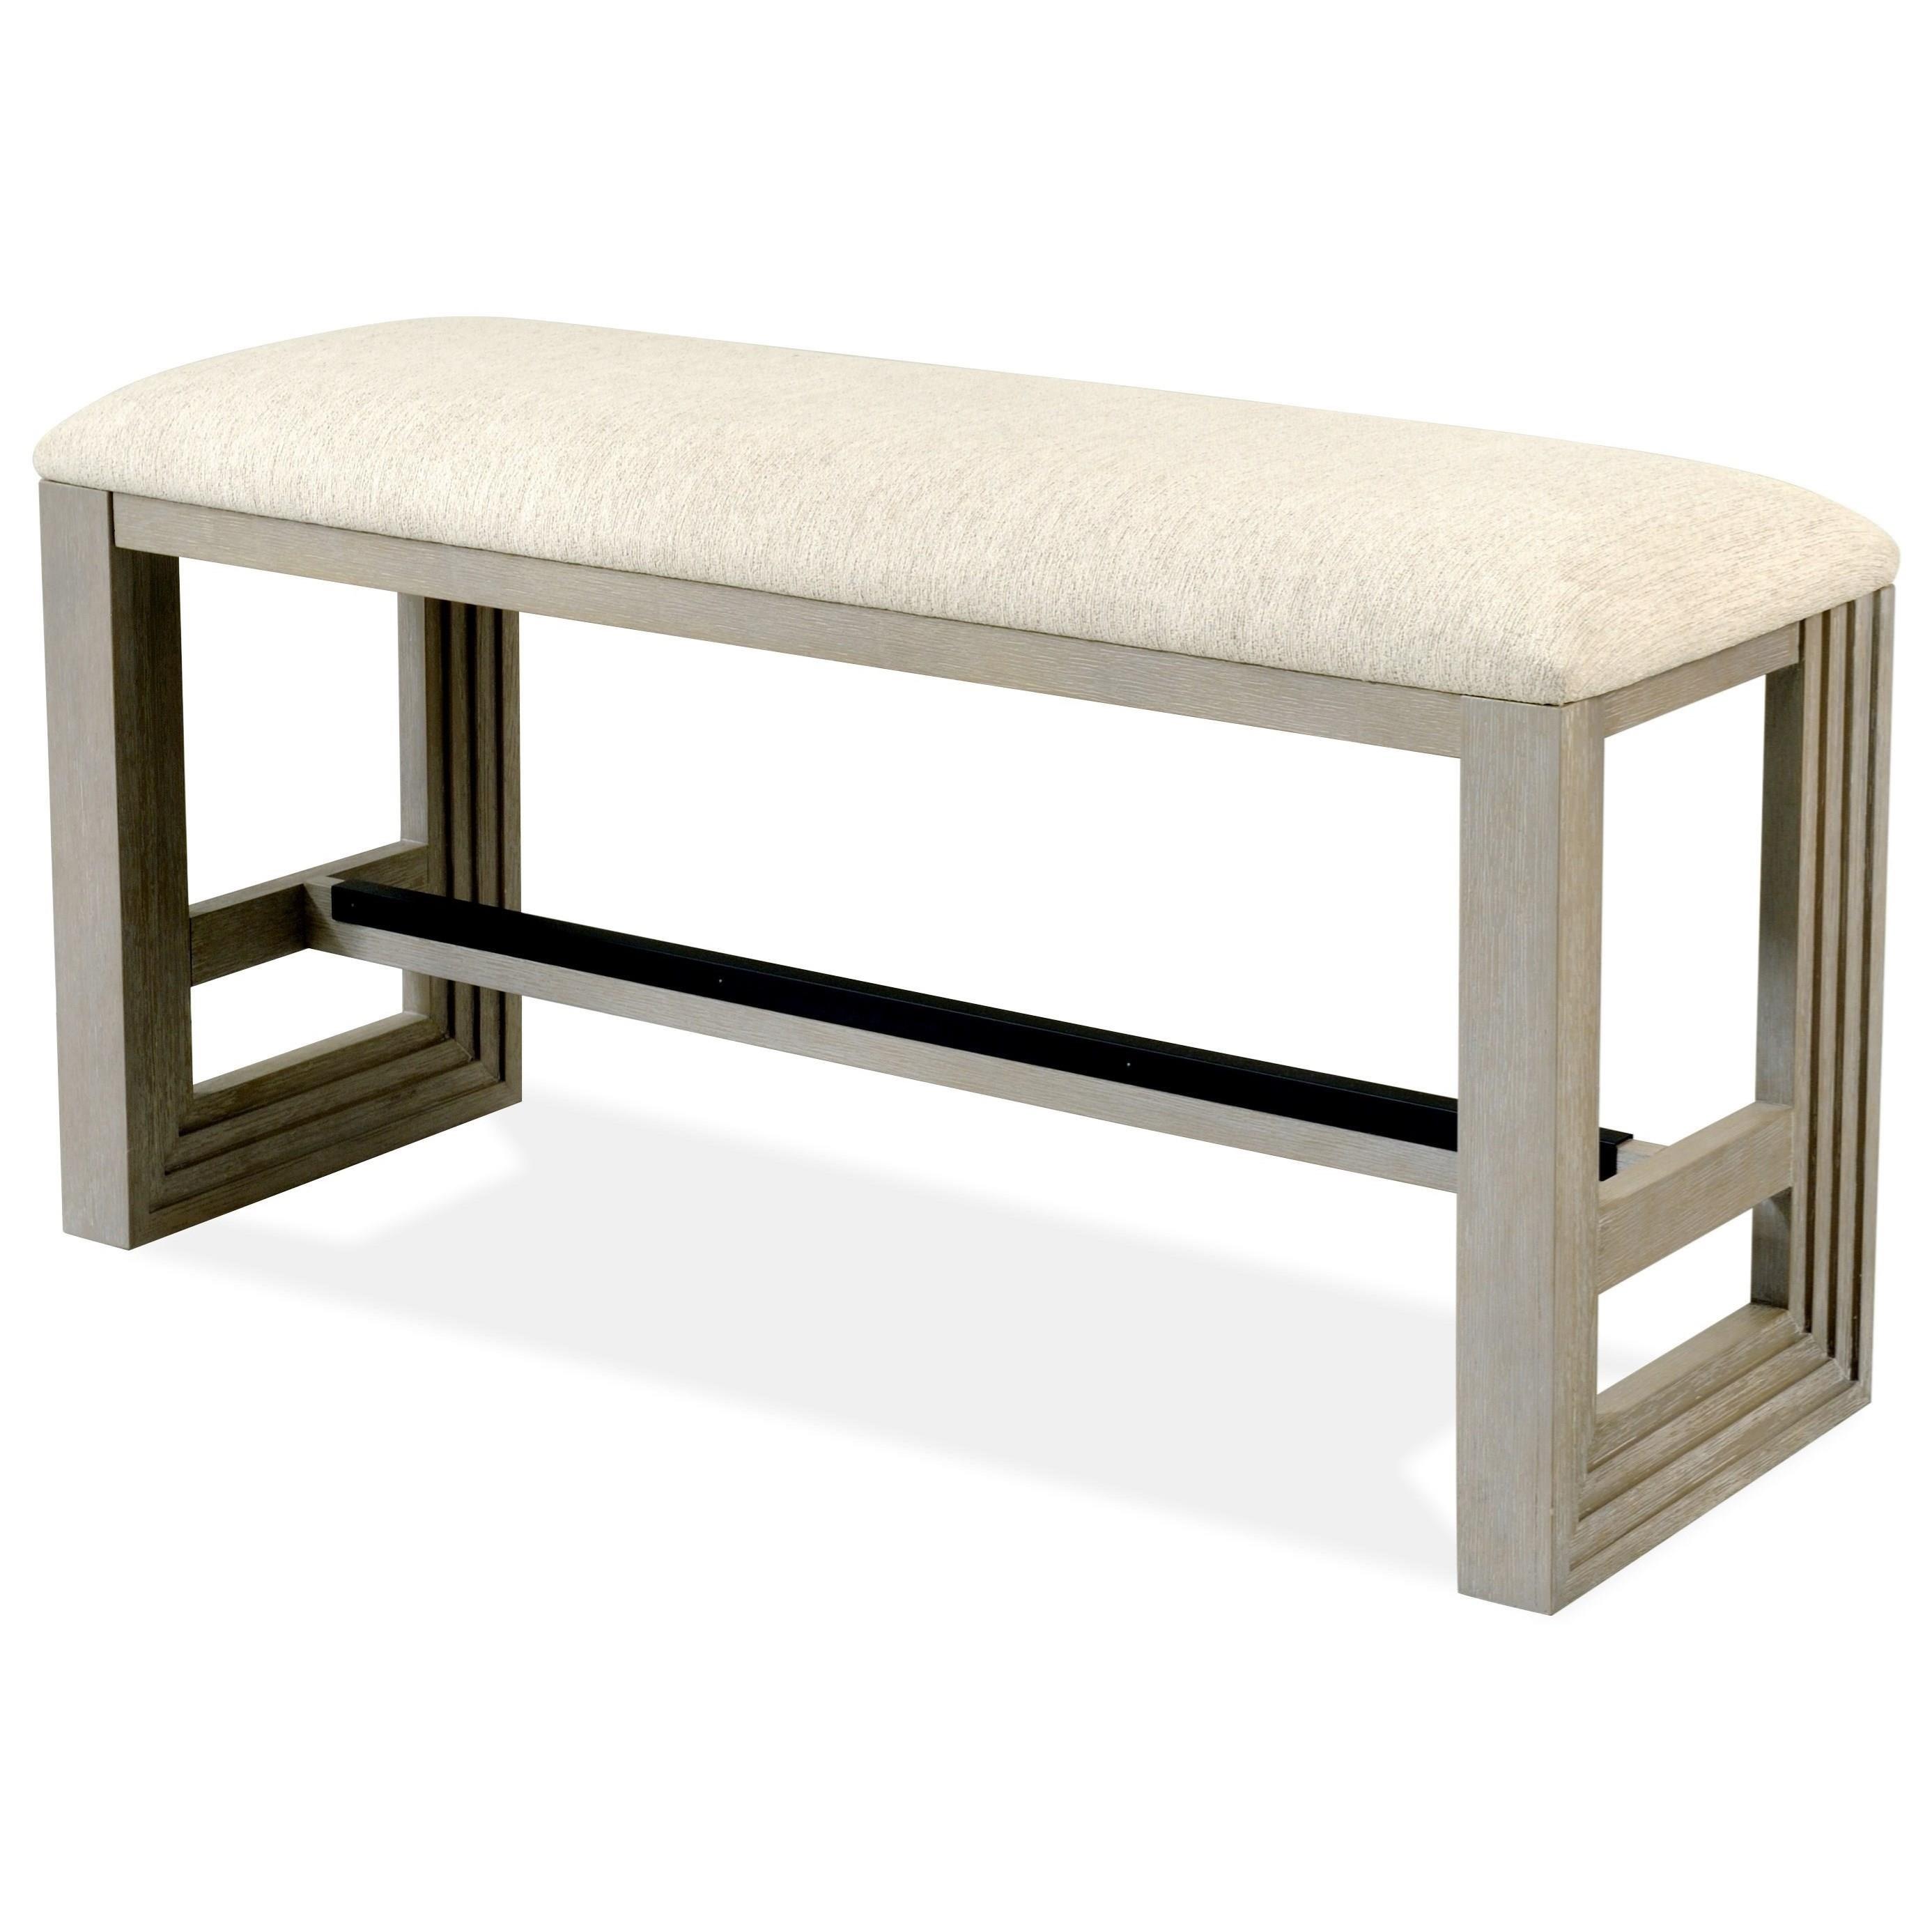 Cassandra Cassandra Counter Bench by Riverside Furniture at Morris Home